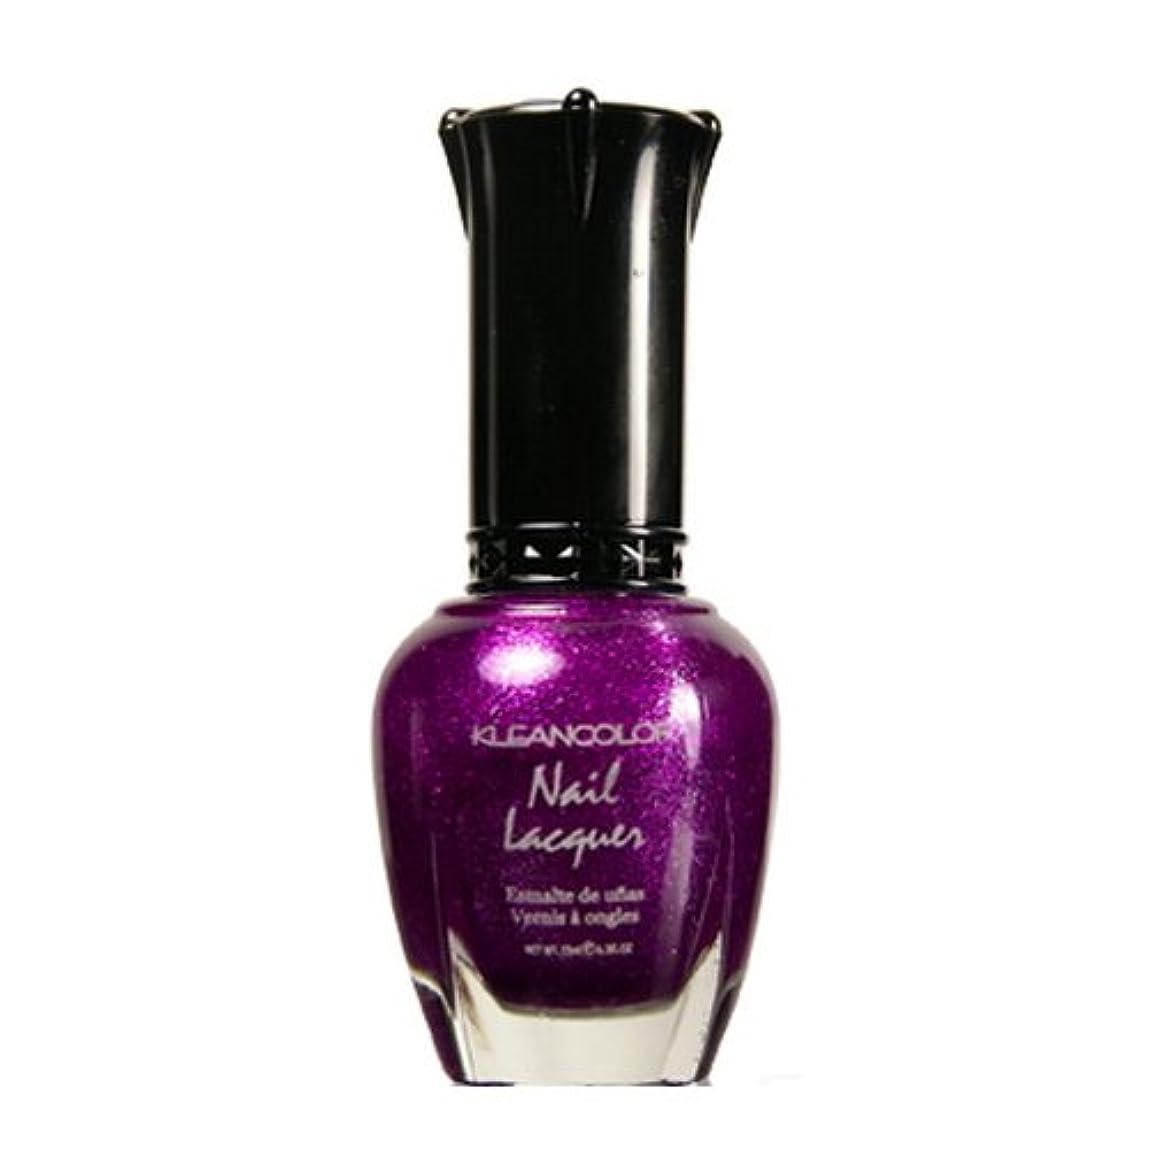 KLEANCOLOR Nail Lacquer 4 - Sparkling Grapes (並行輸入品)